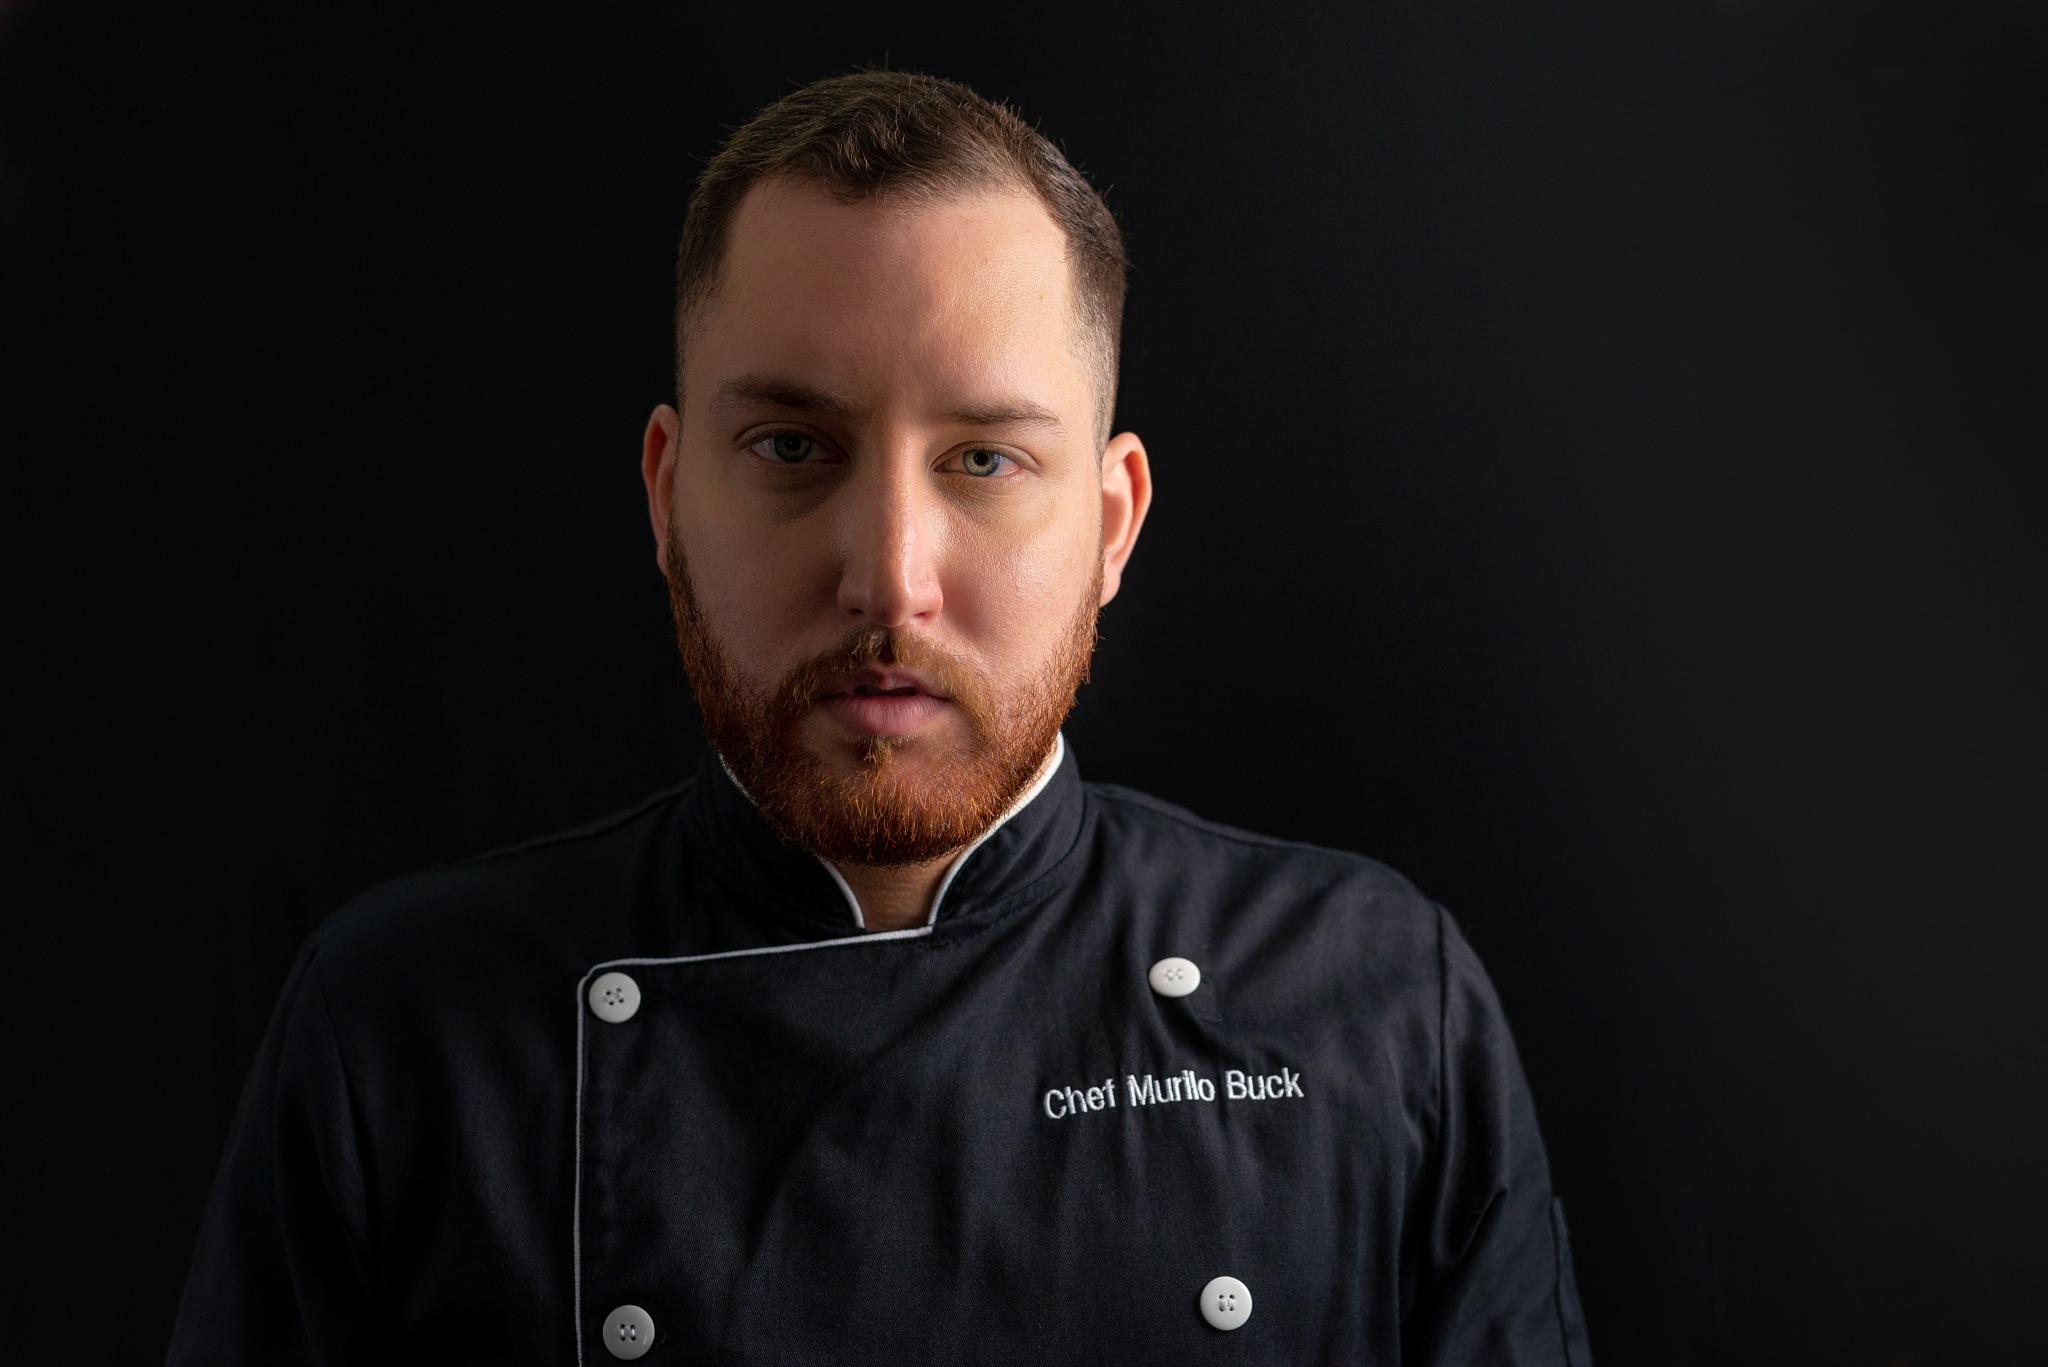 Chef headshot by Pedro Linhares Machado Marchi